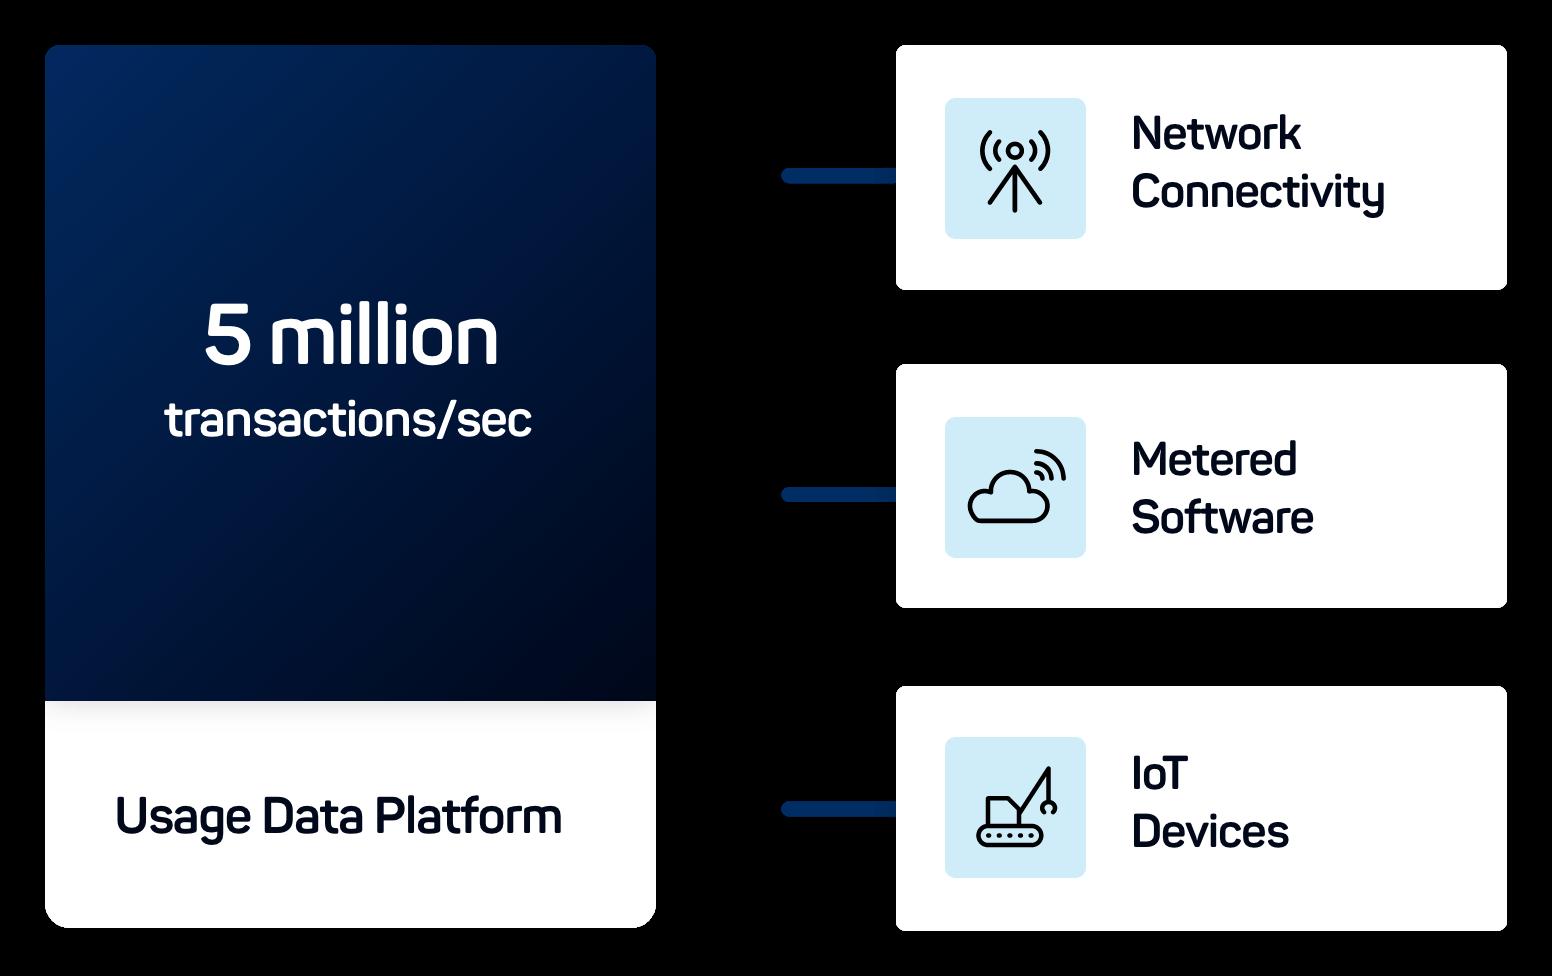 Usage data platform icon